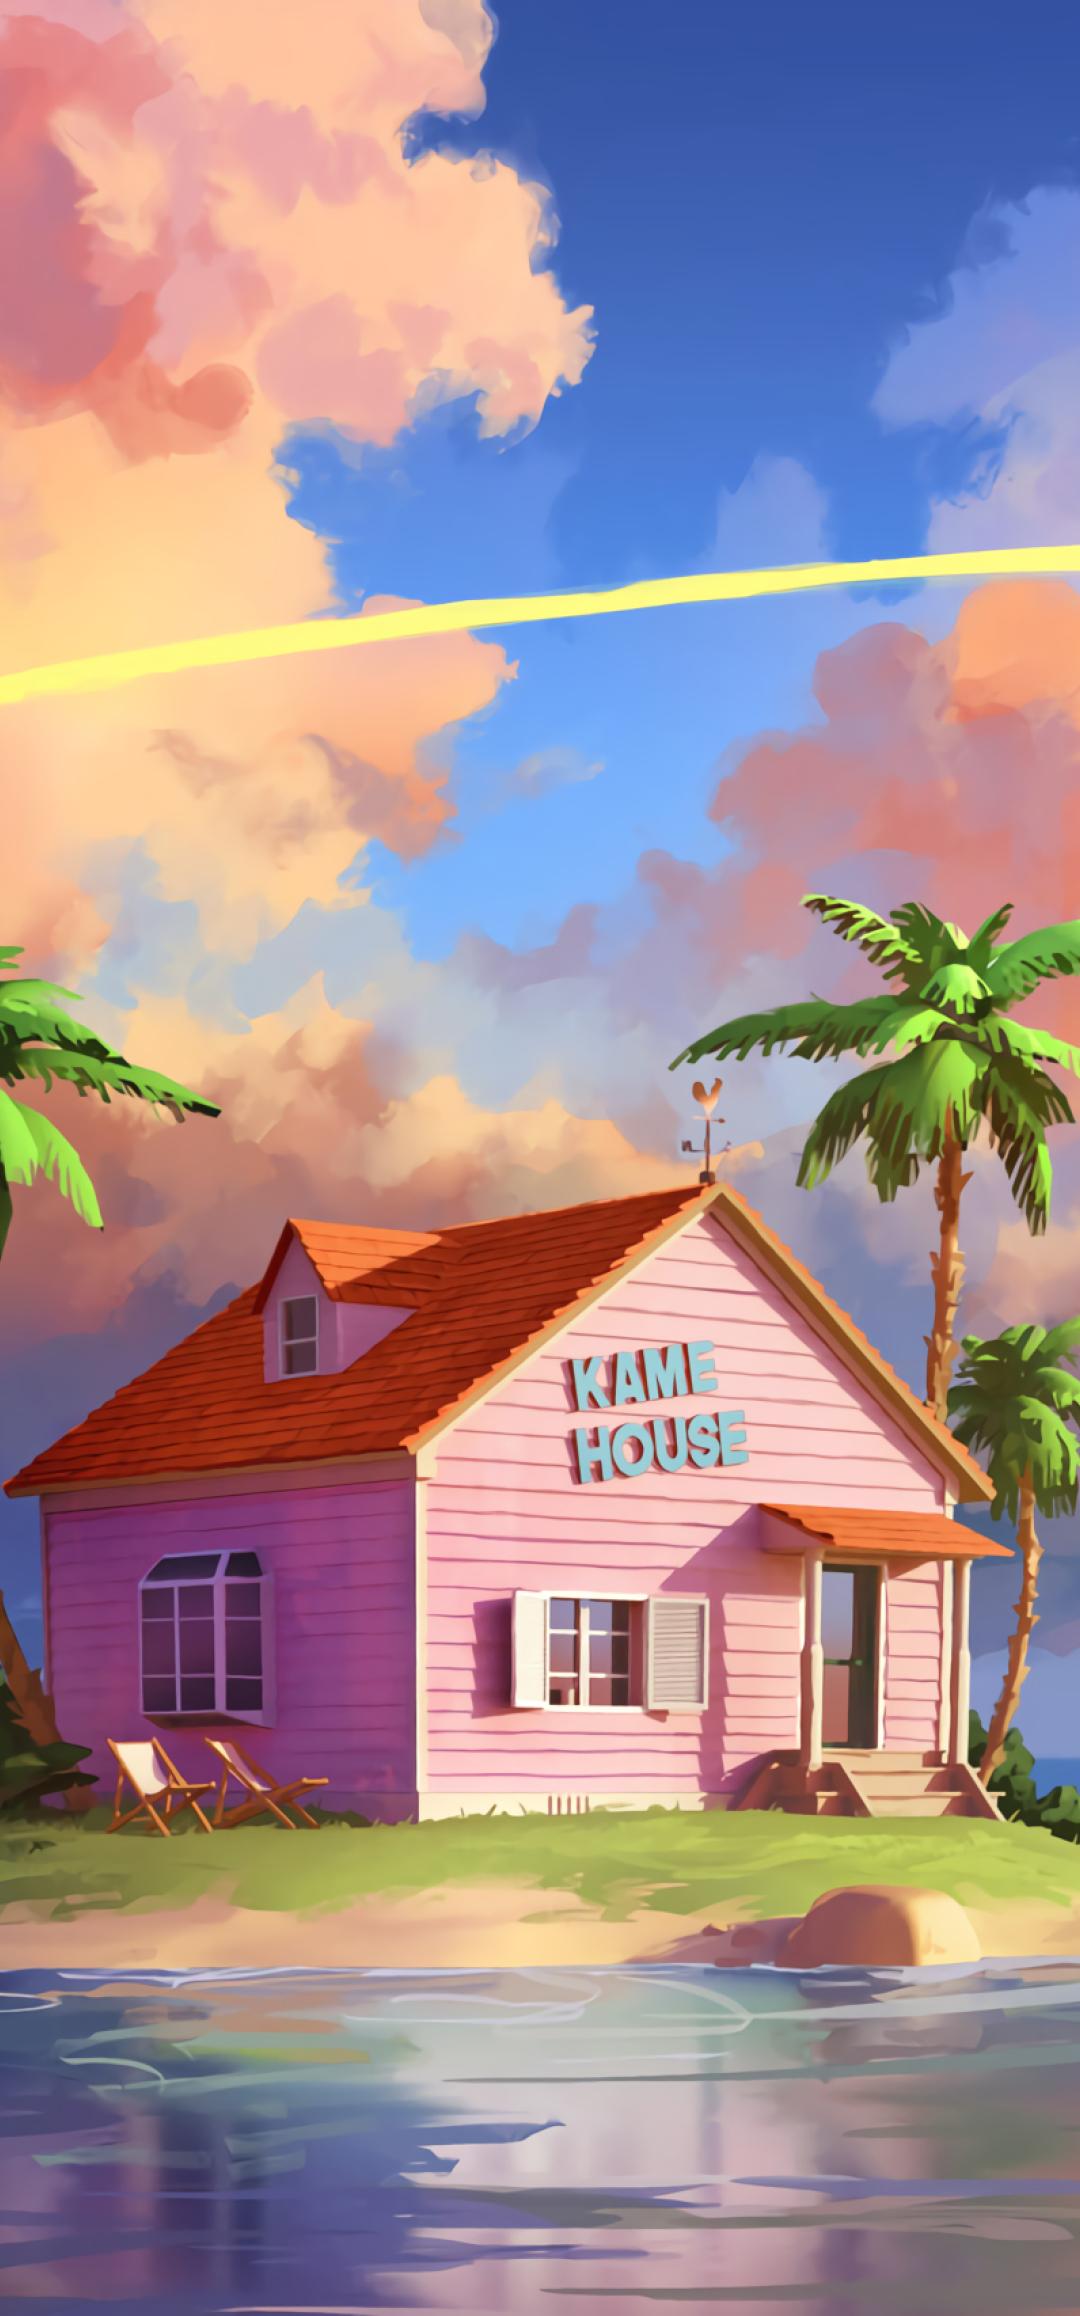 1080x2316 Kame House Dragon Ball Z 1080x2316 Resolution ...